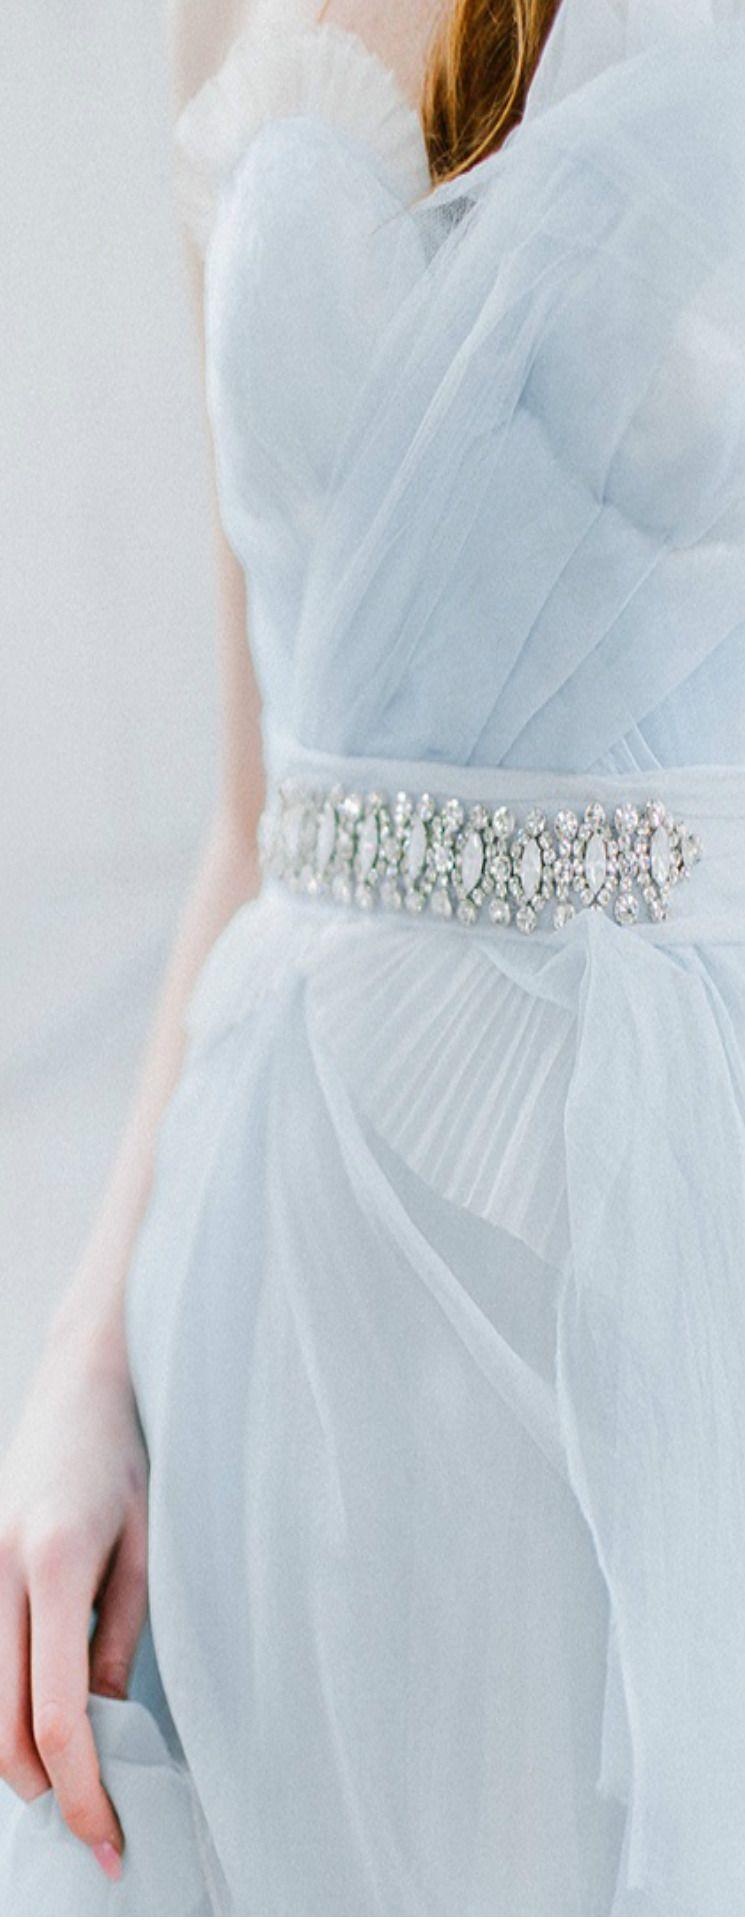 esküvő halványkék pinterest baby blue color blue and